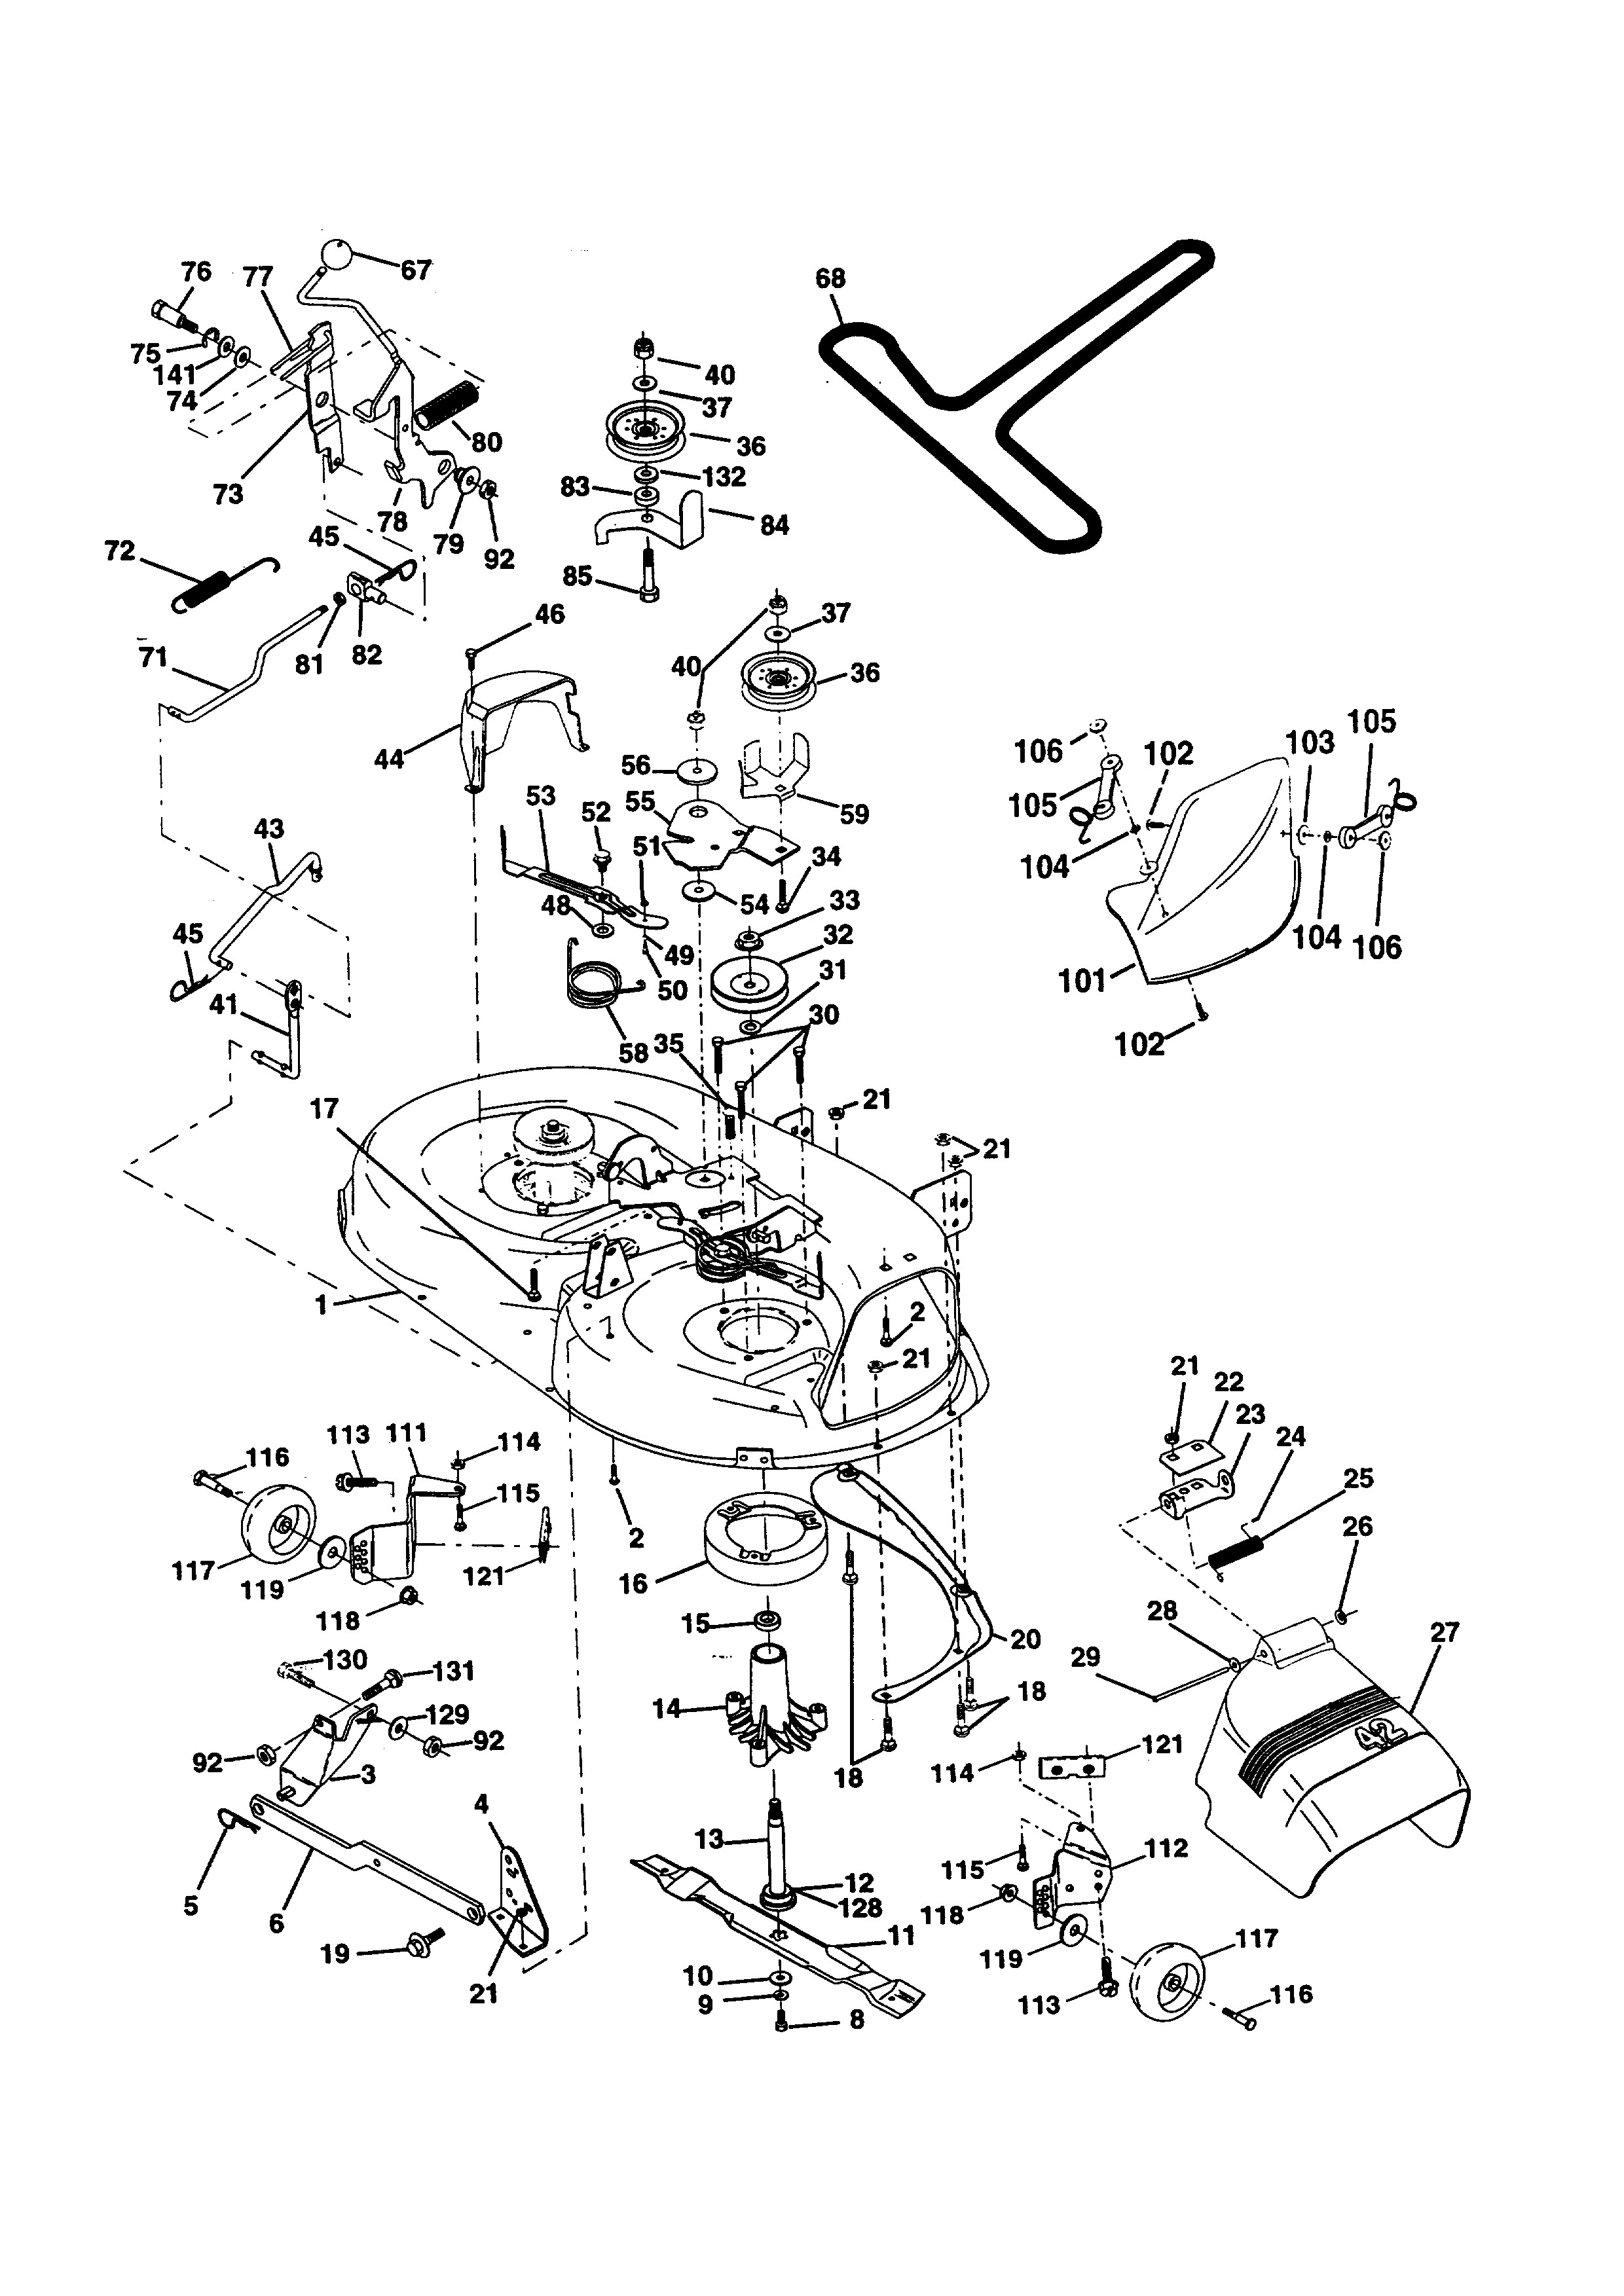 Parts Diagram for Briggs Stratton Engine Western Auto Model Ayp9187b89 Lawn Tractor Genuine Parts Of Parts Diagram for Briggs Stratton Engine